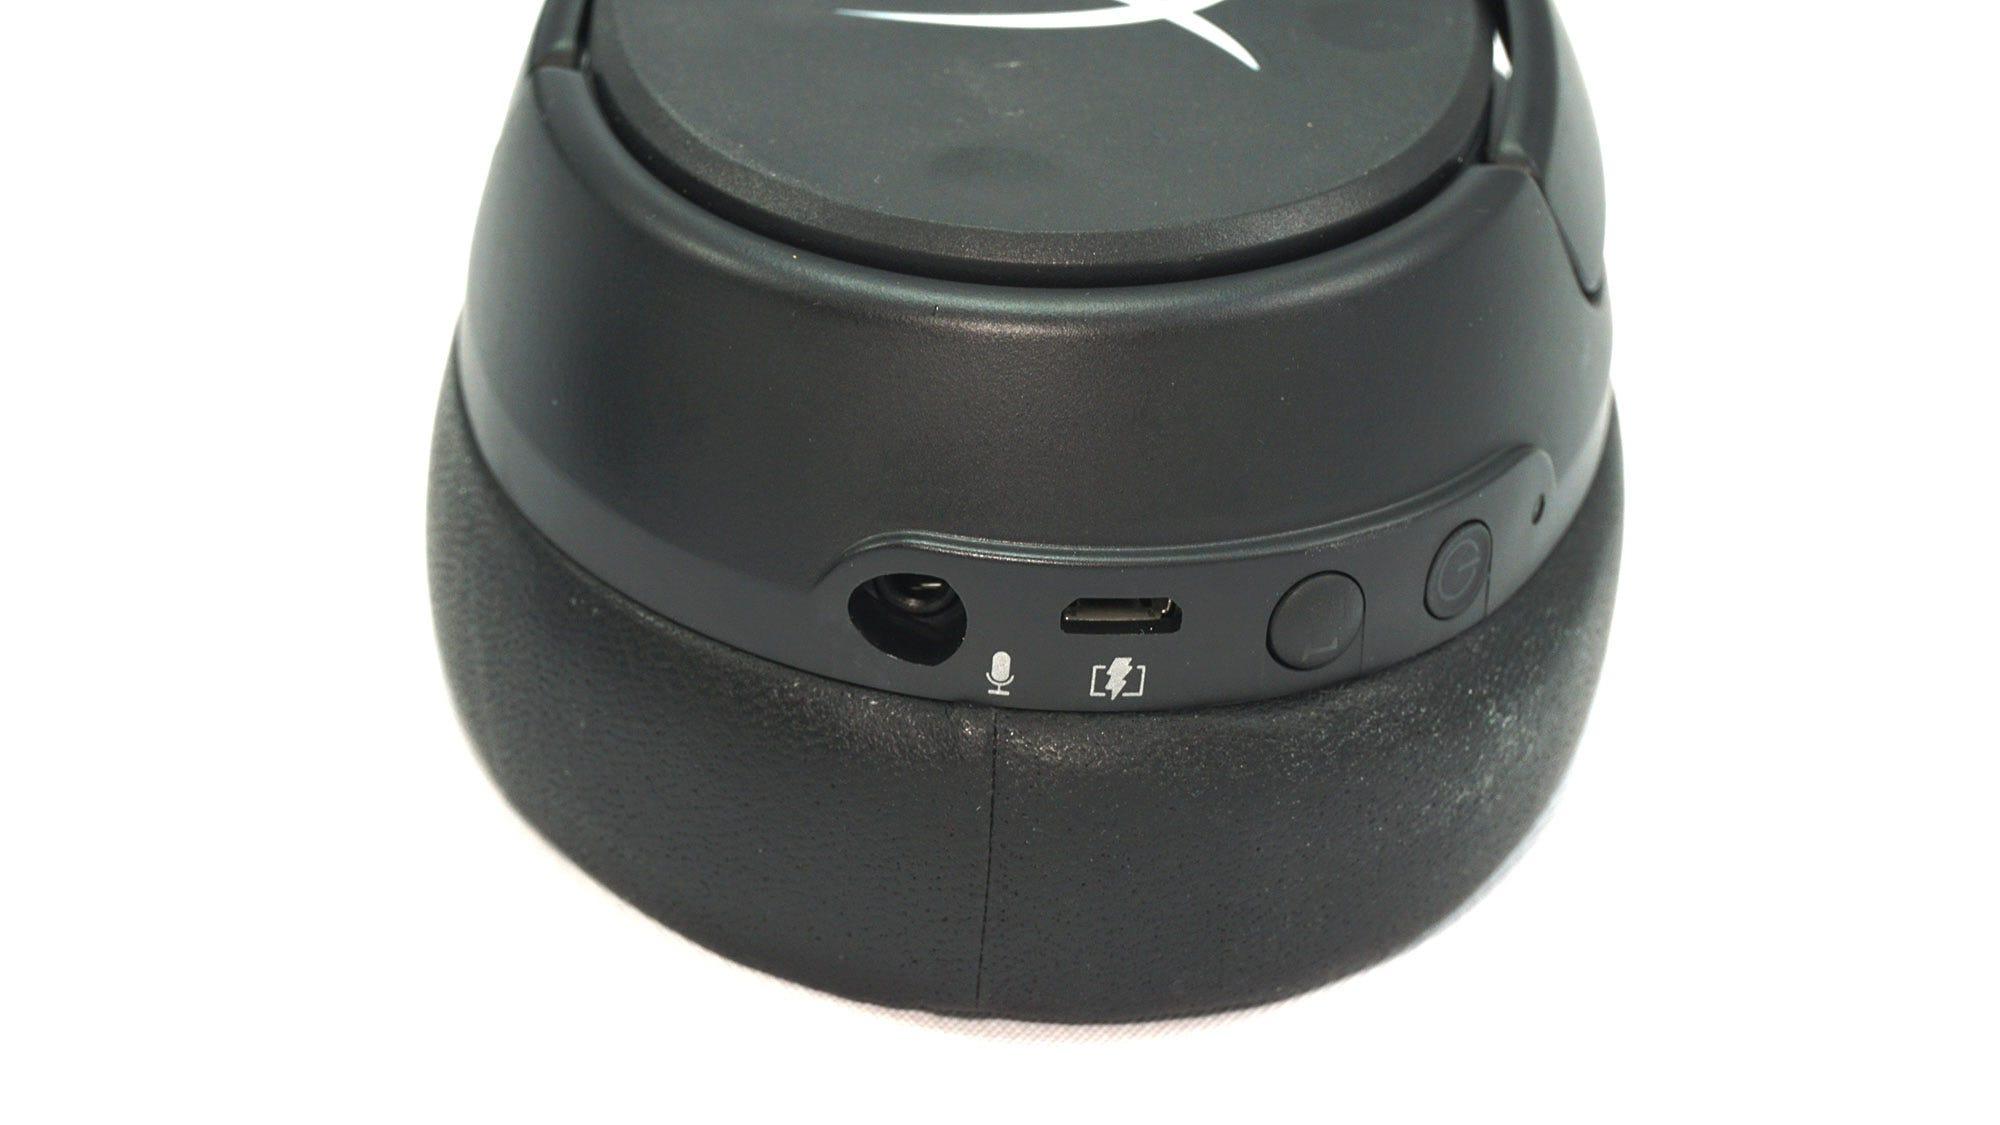 Charging port and detachable mic boom port.